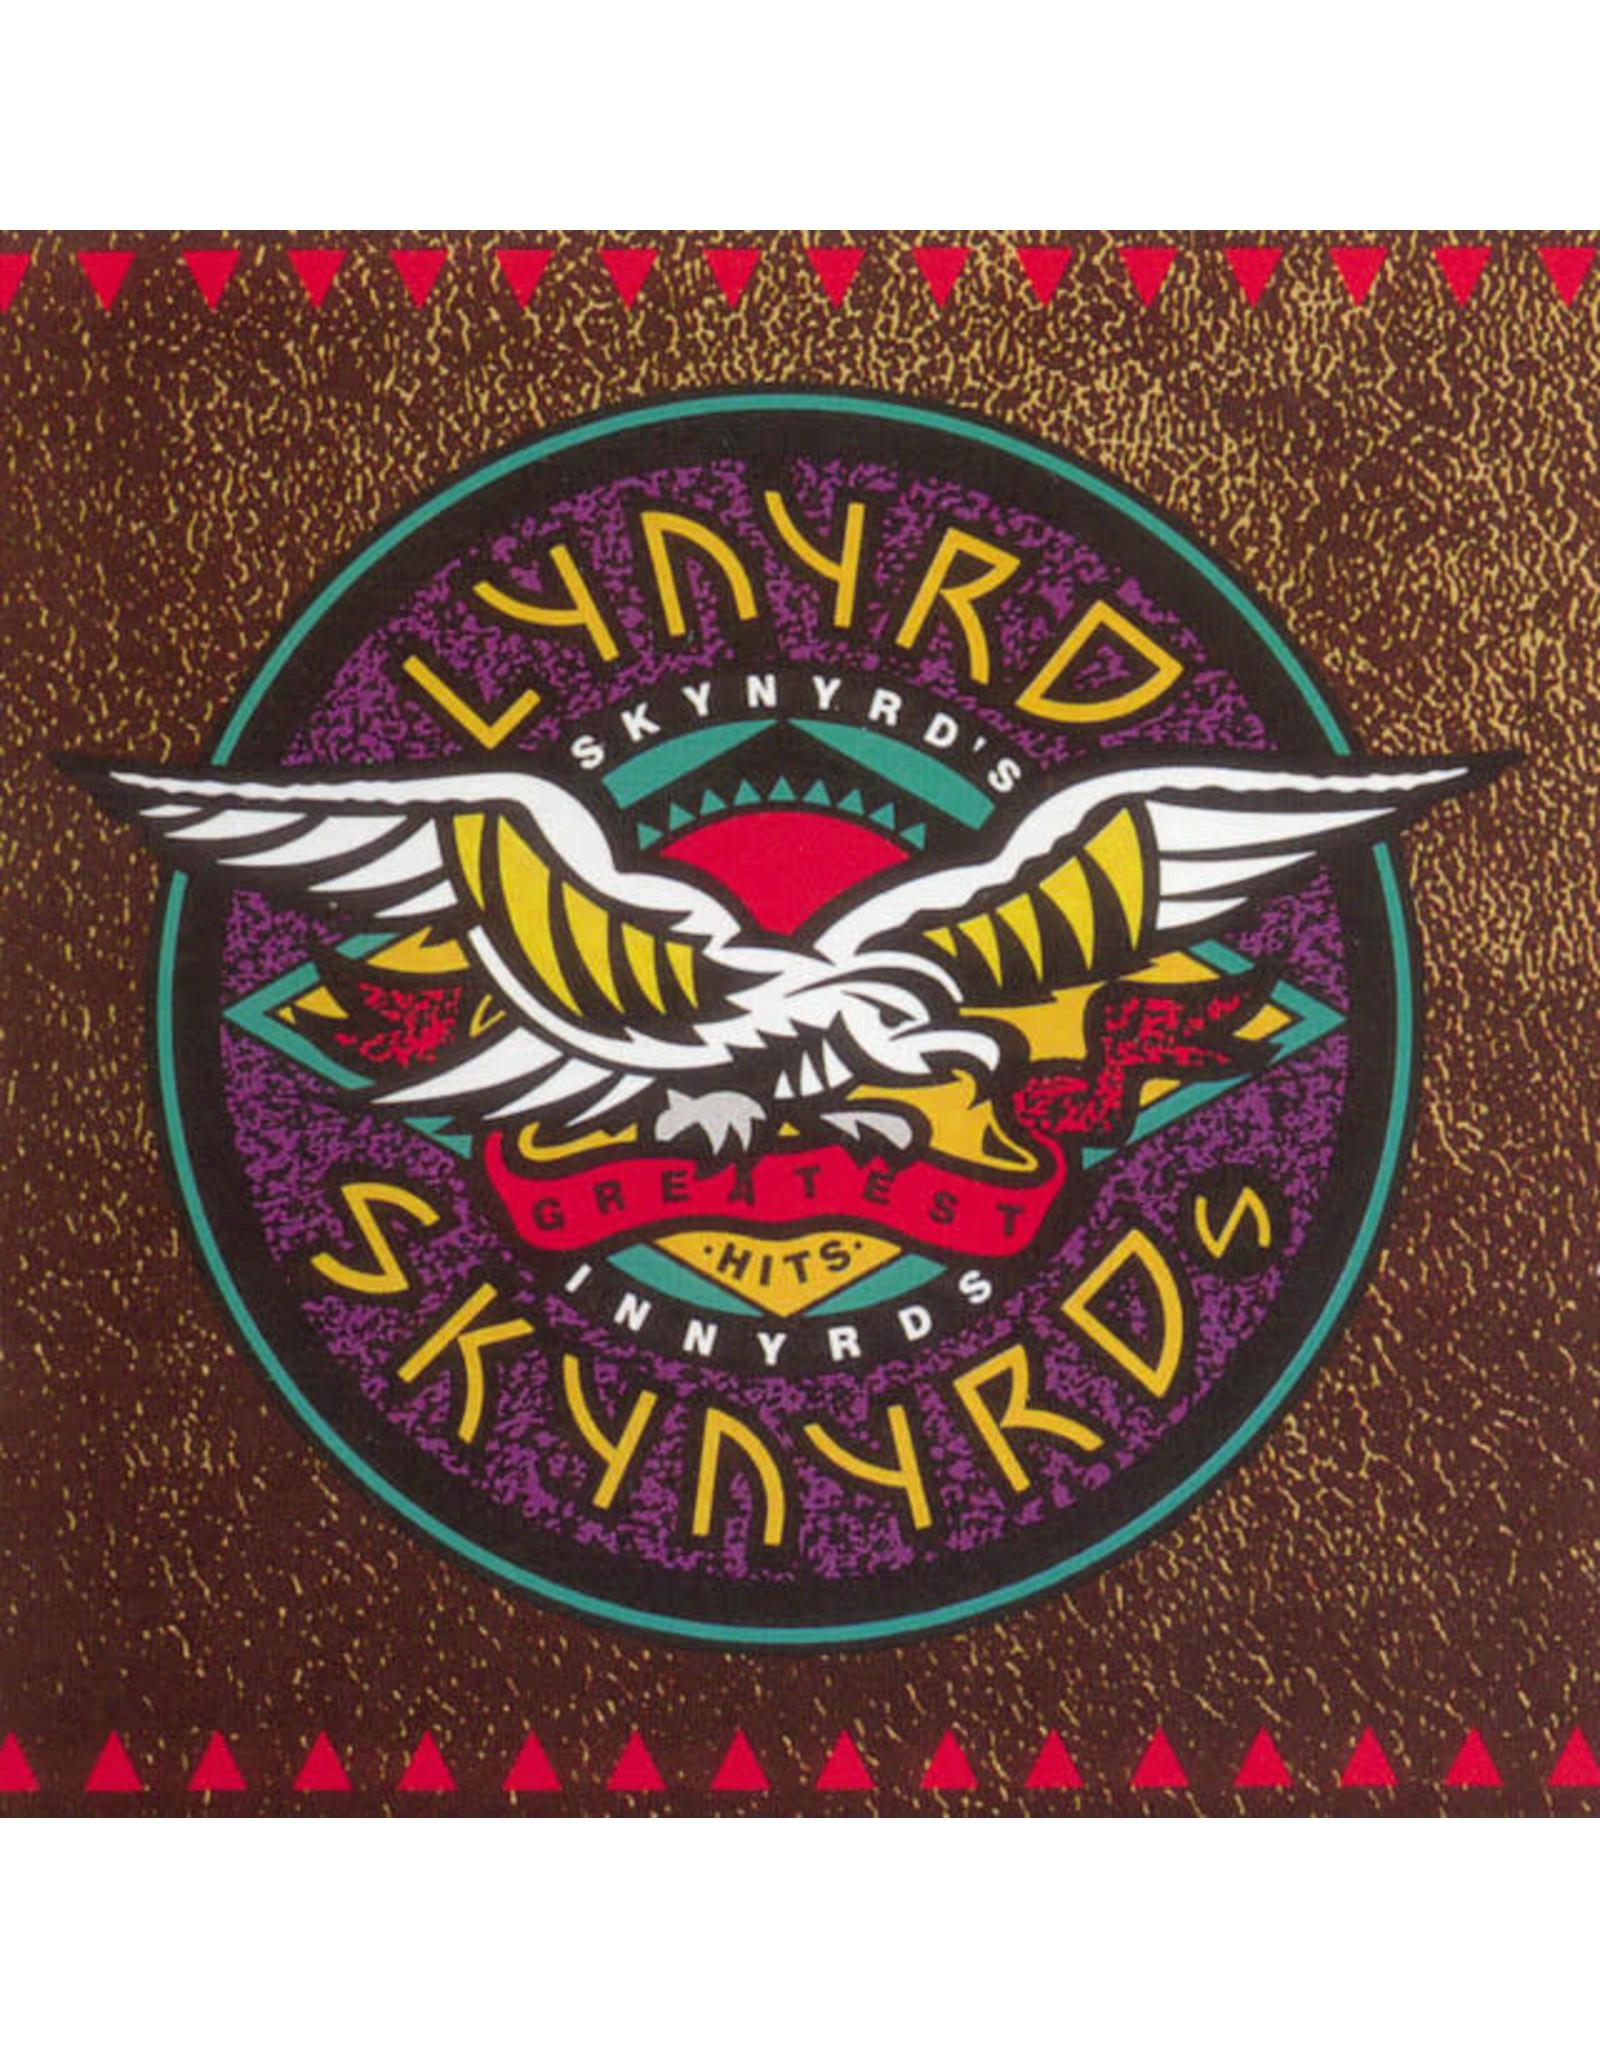 Vinyl Lynyrd Skynyrd - Greatest Hits